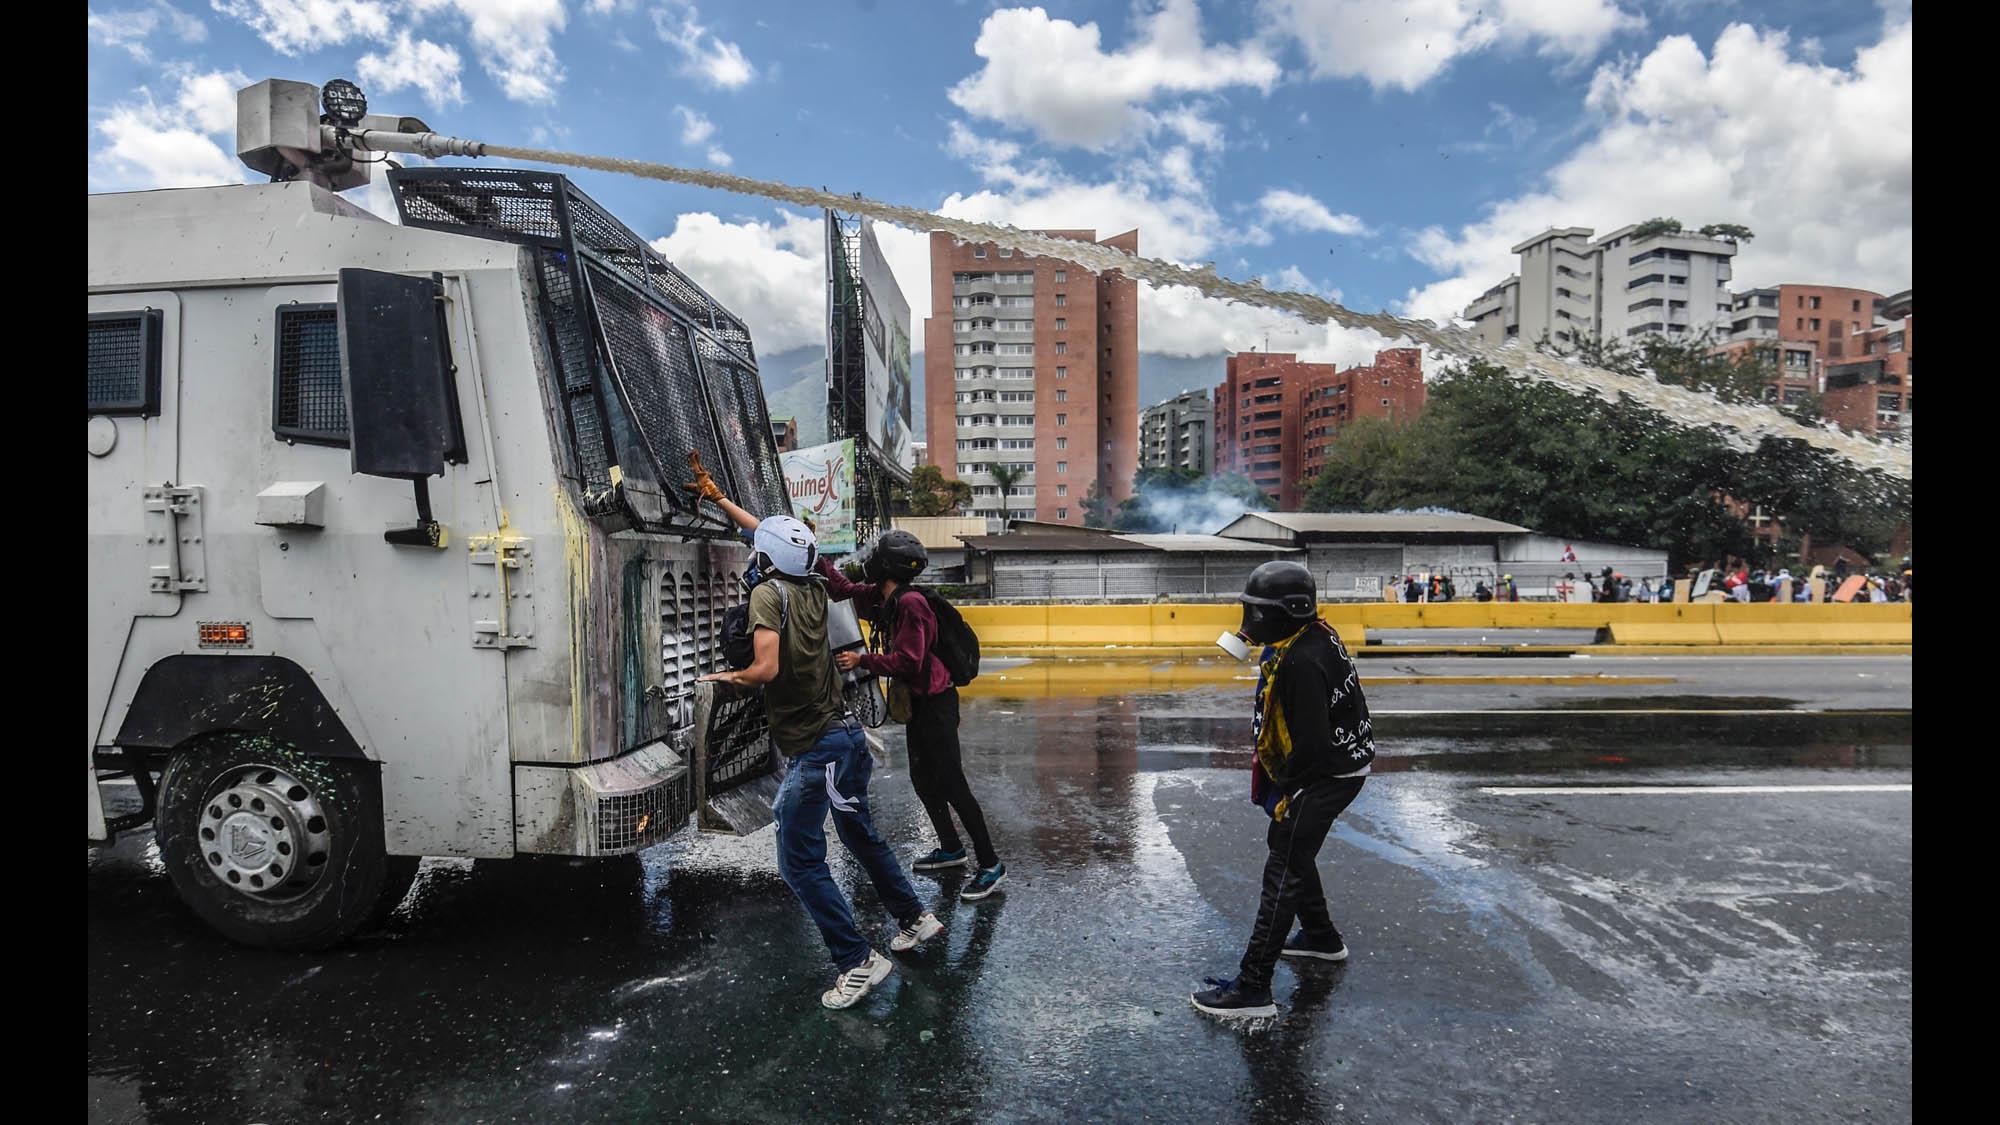 Https 2017 07 31 Design Gallery Pollution Popsicles Waltz Dance Steps Diagram Http Gal2piclabus Key Waltzsteps 170623120112 05 Venezuela Protest 0619